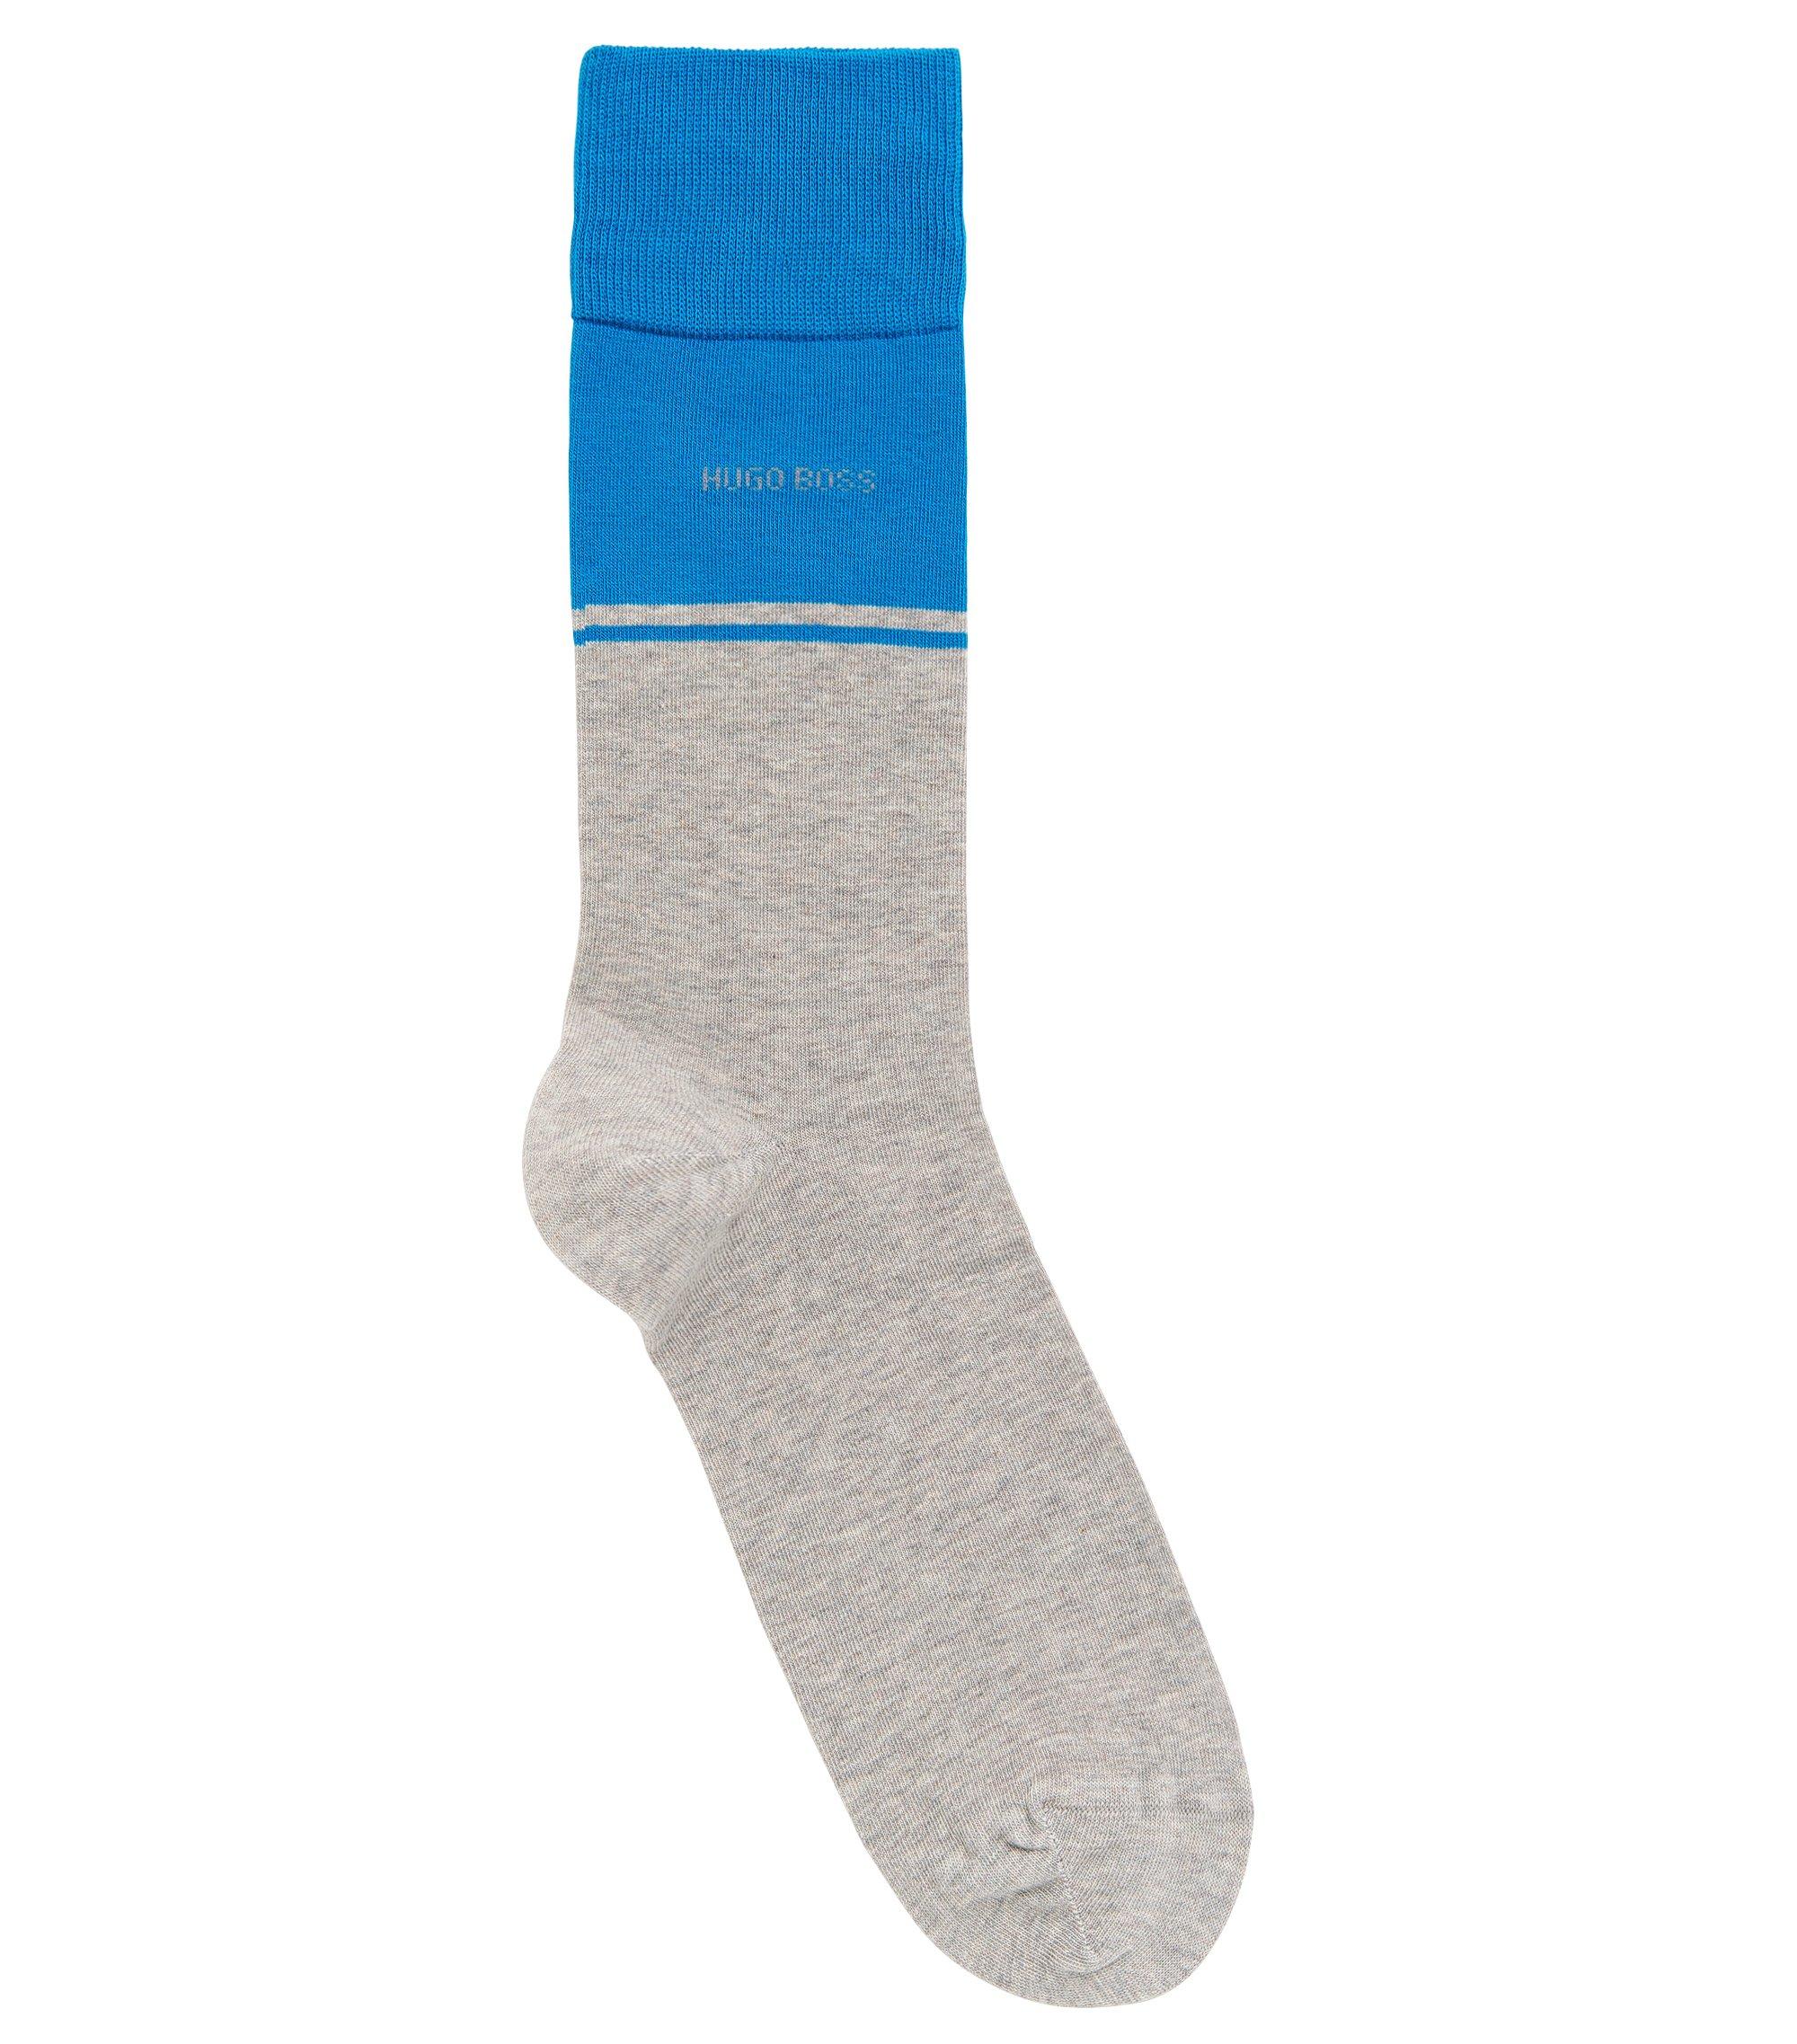 Stretch Cotton Blend Sock | RS Design US, Silver